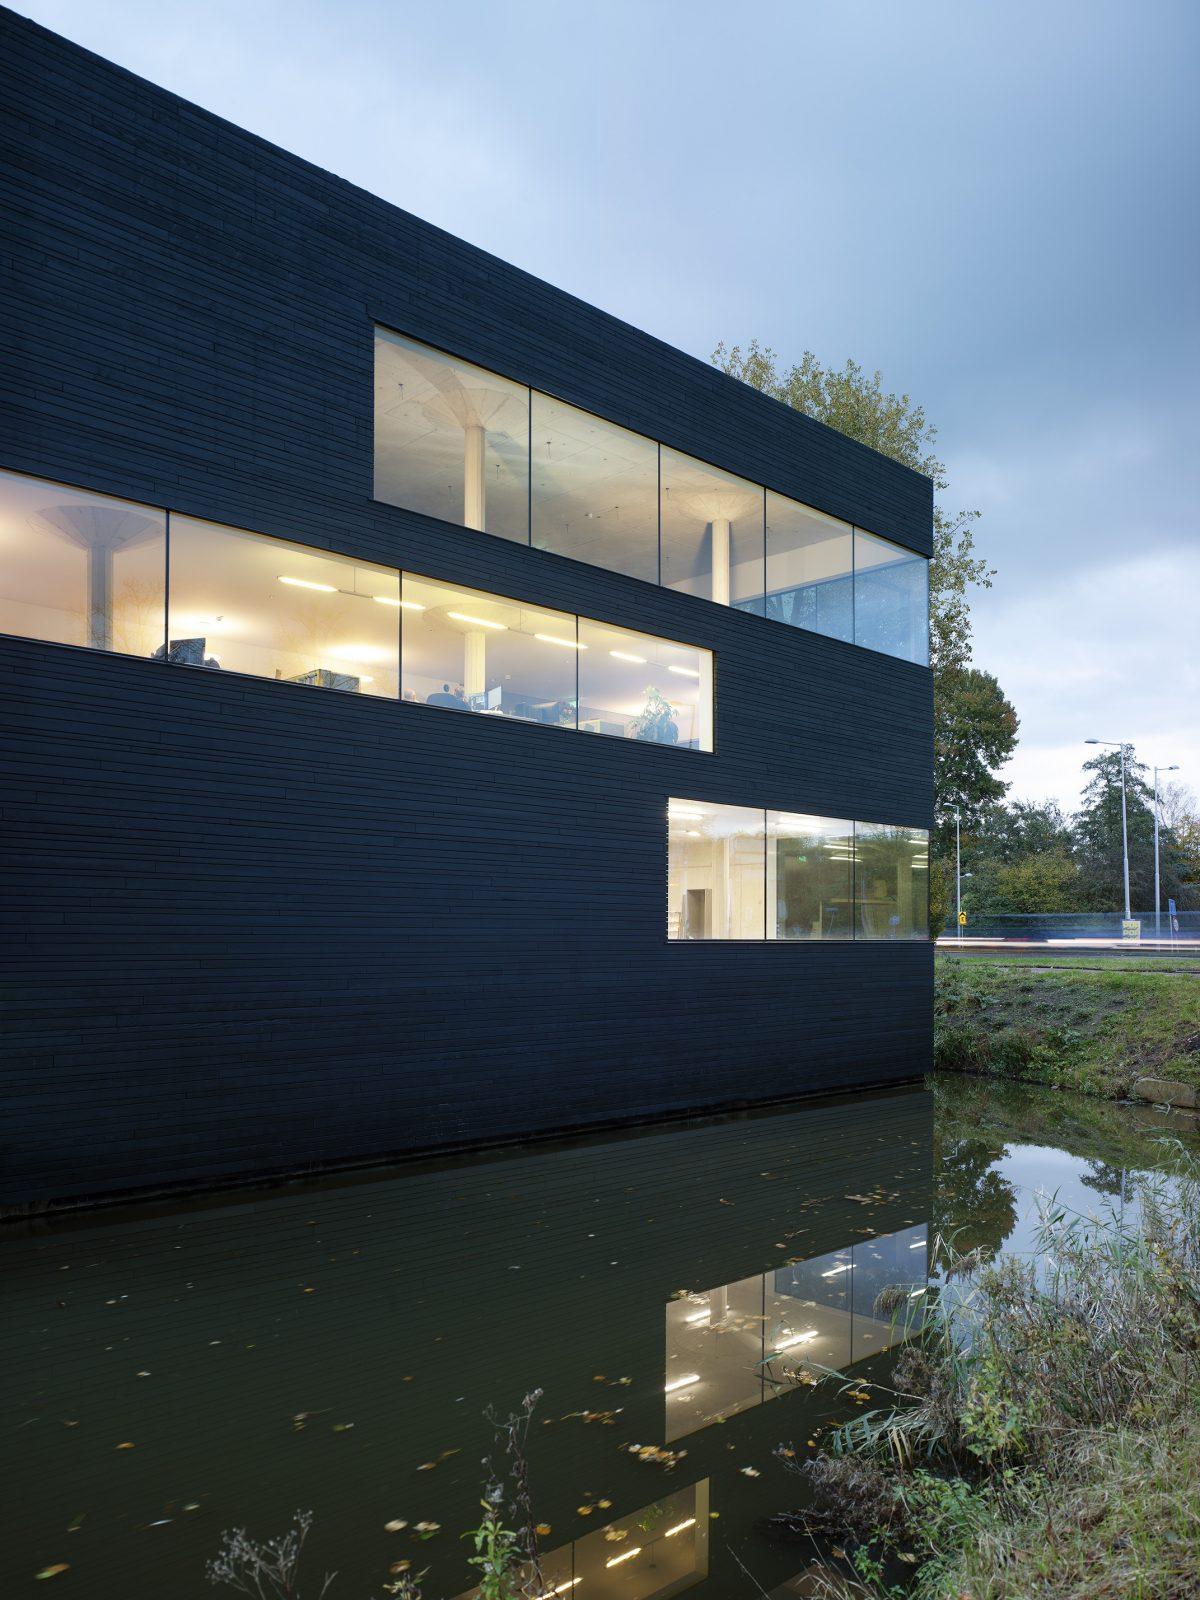 Loer Architecten Terbregsehof 11 foto 4 3000